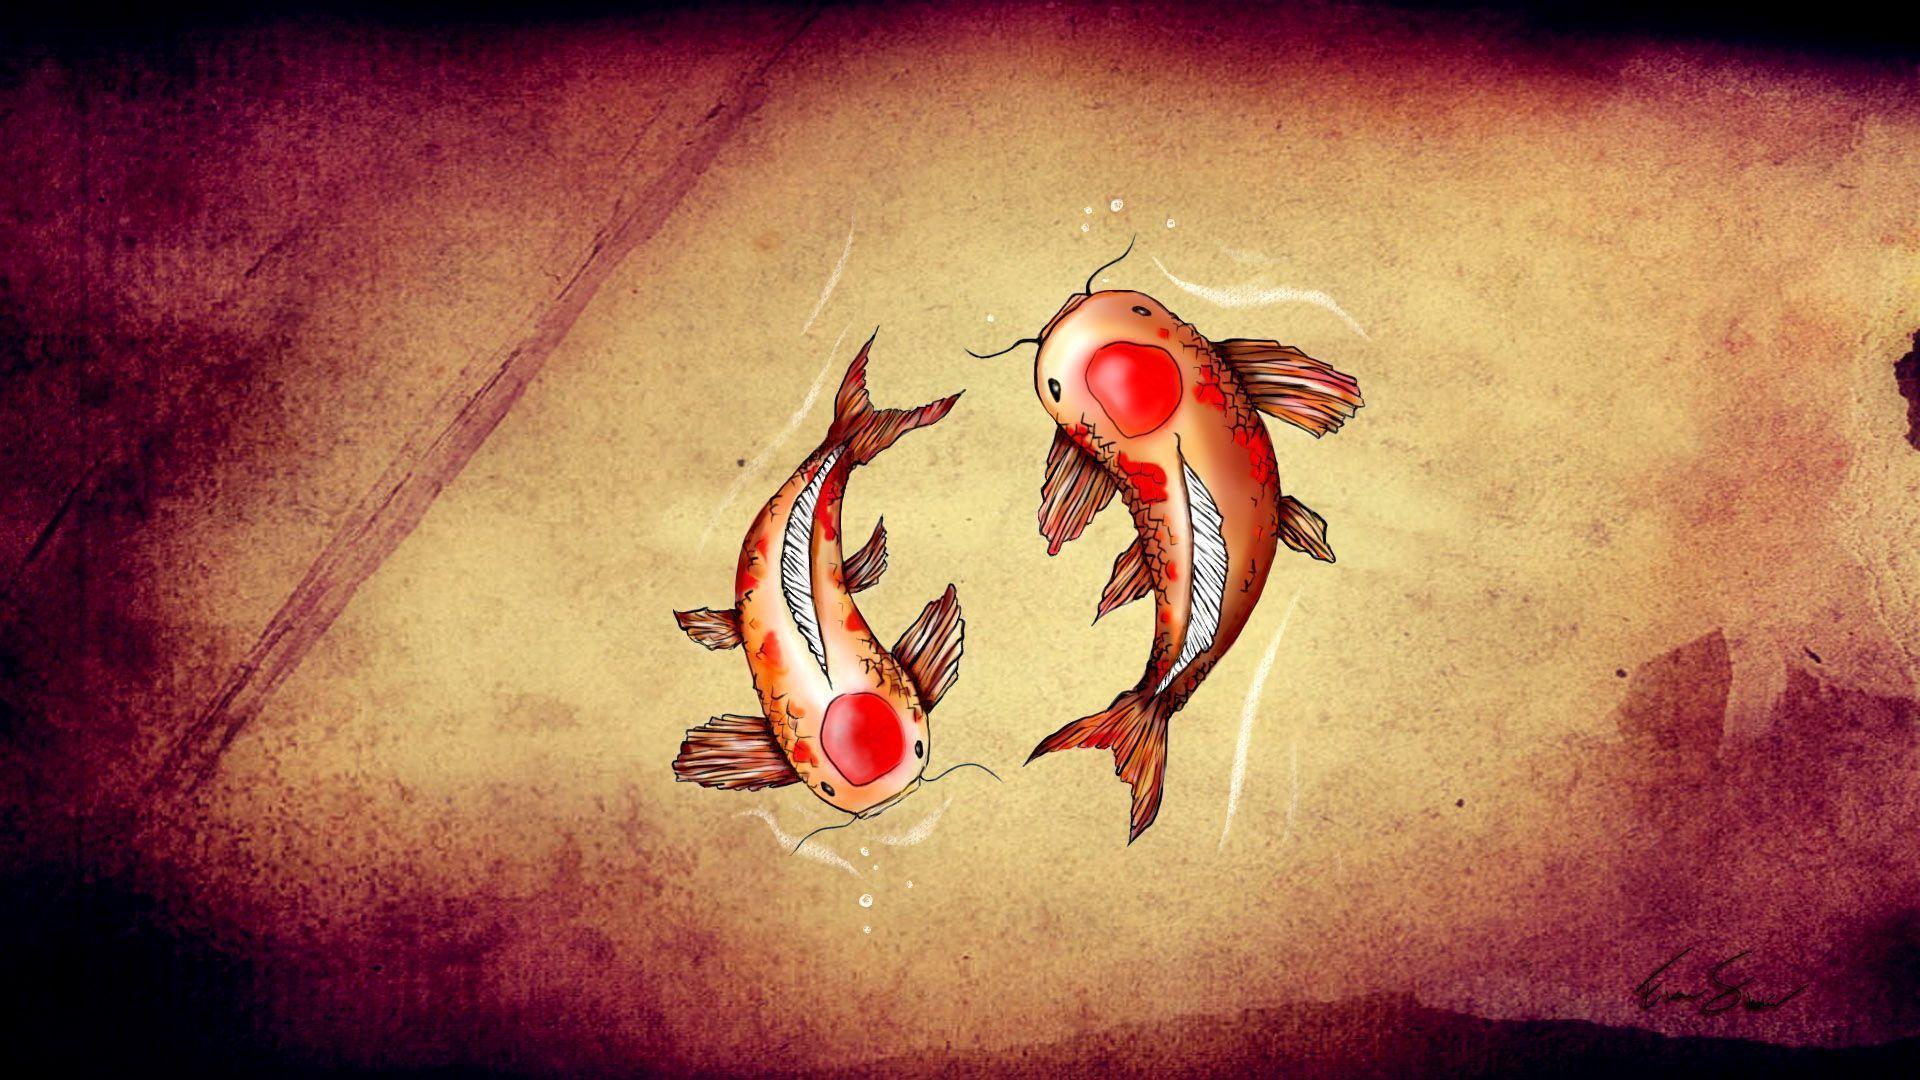 Coy fish wallpapers wallpaper cave - Carp wallpaper iphone ...